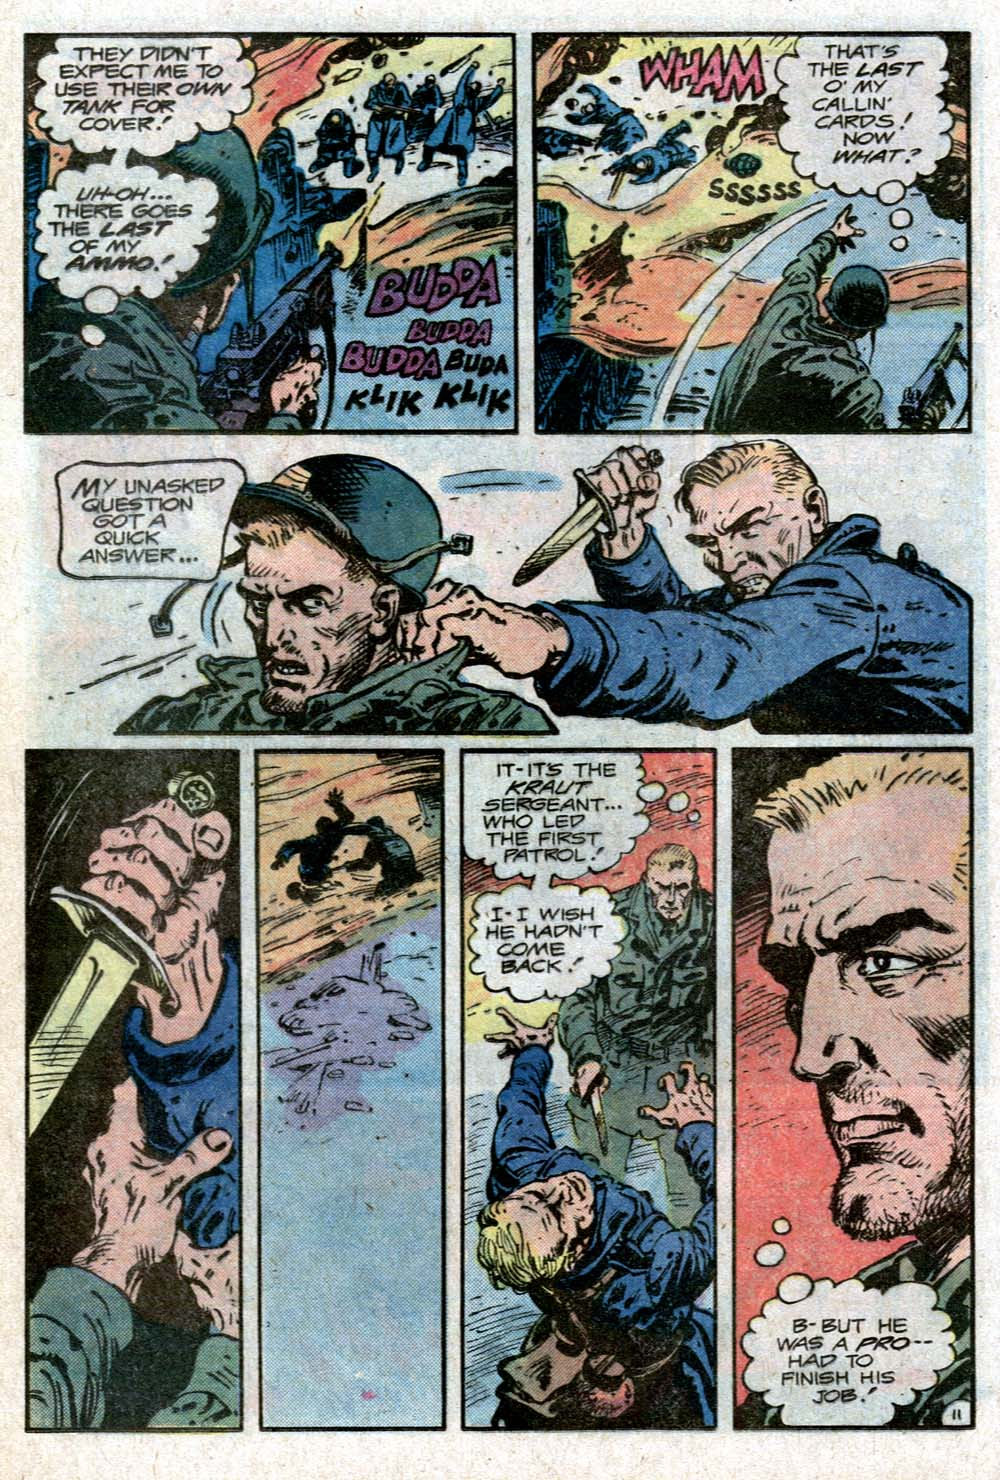 Read online Sgt. Rock comic -  Issue #352 - 14